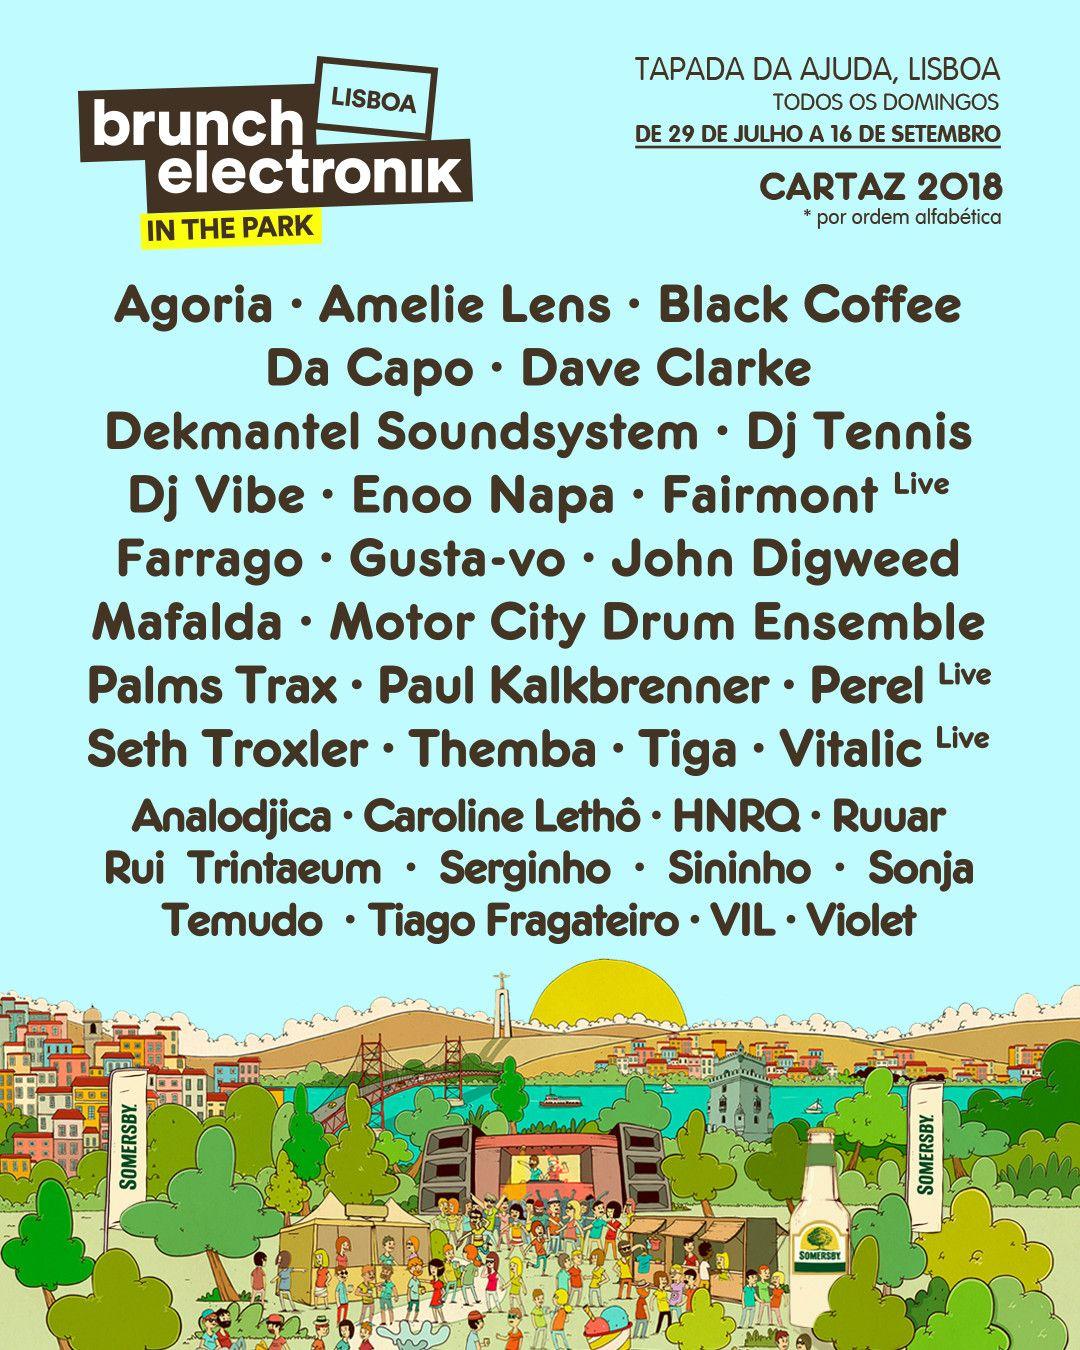 Cartaz completo Brunch Eletronik - In the Park 2018